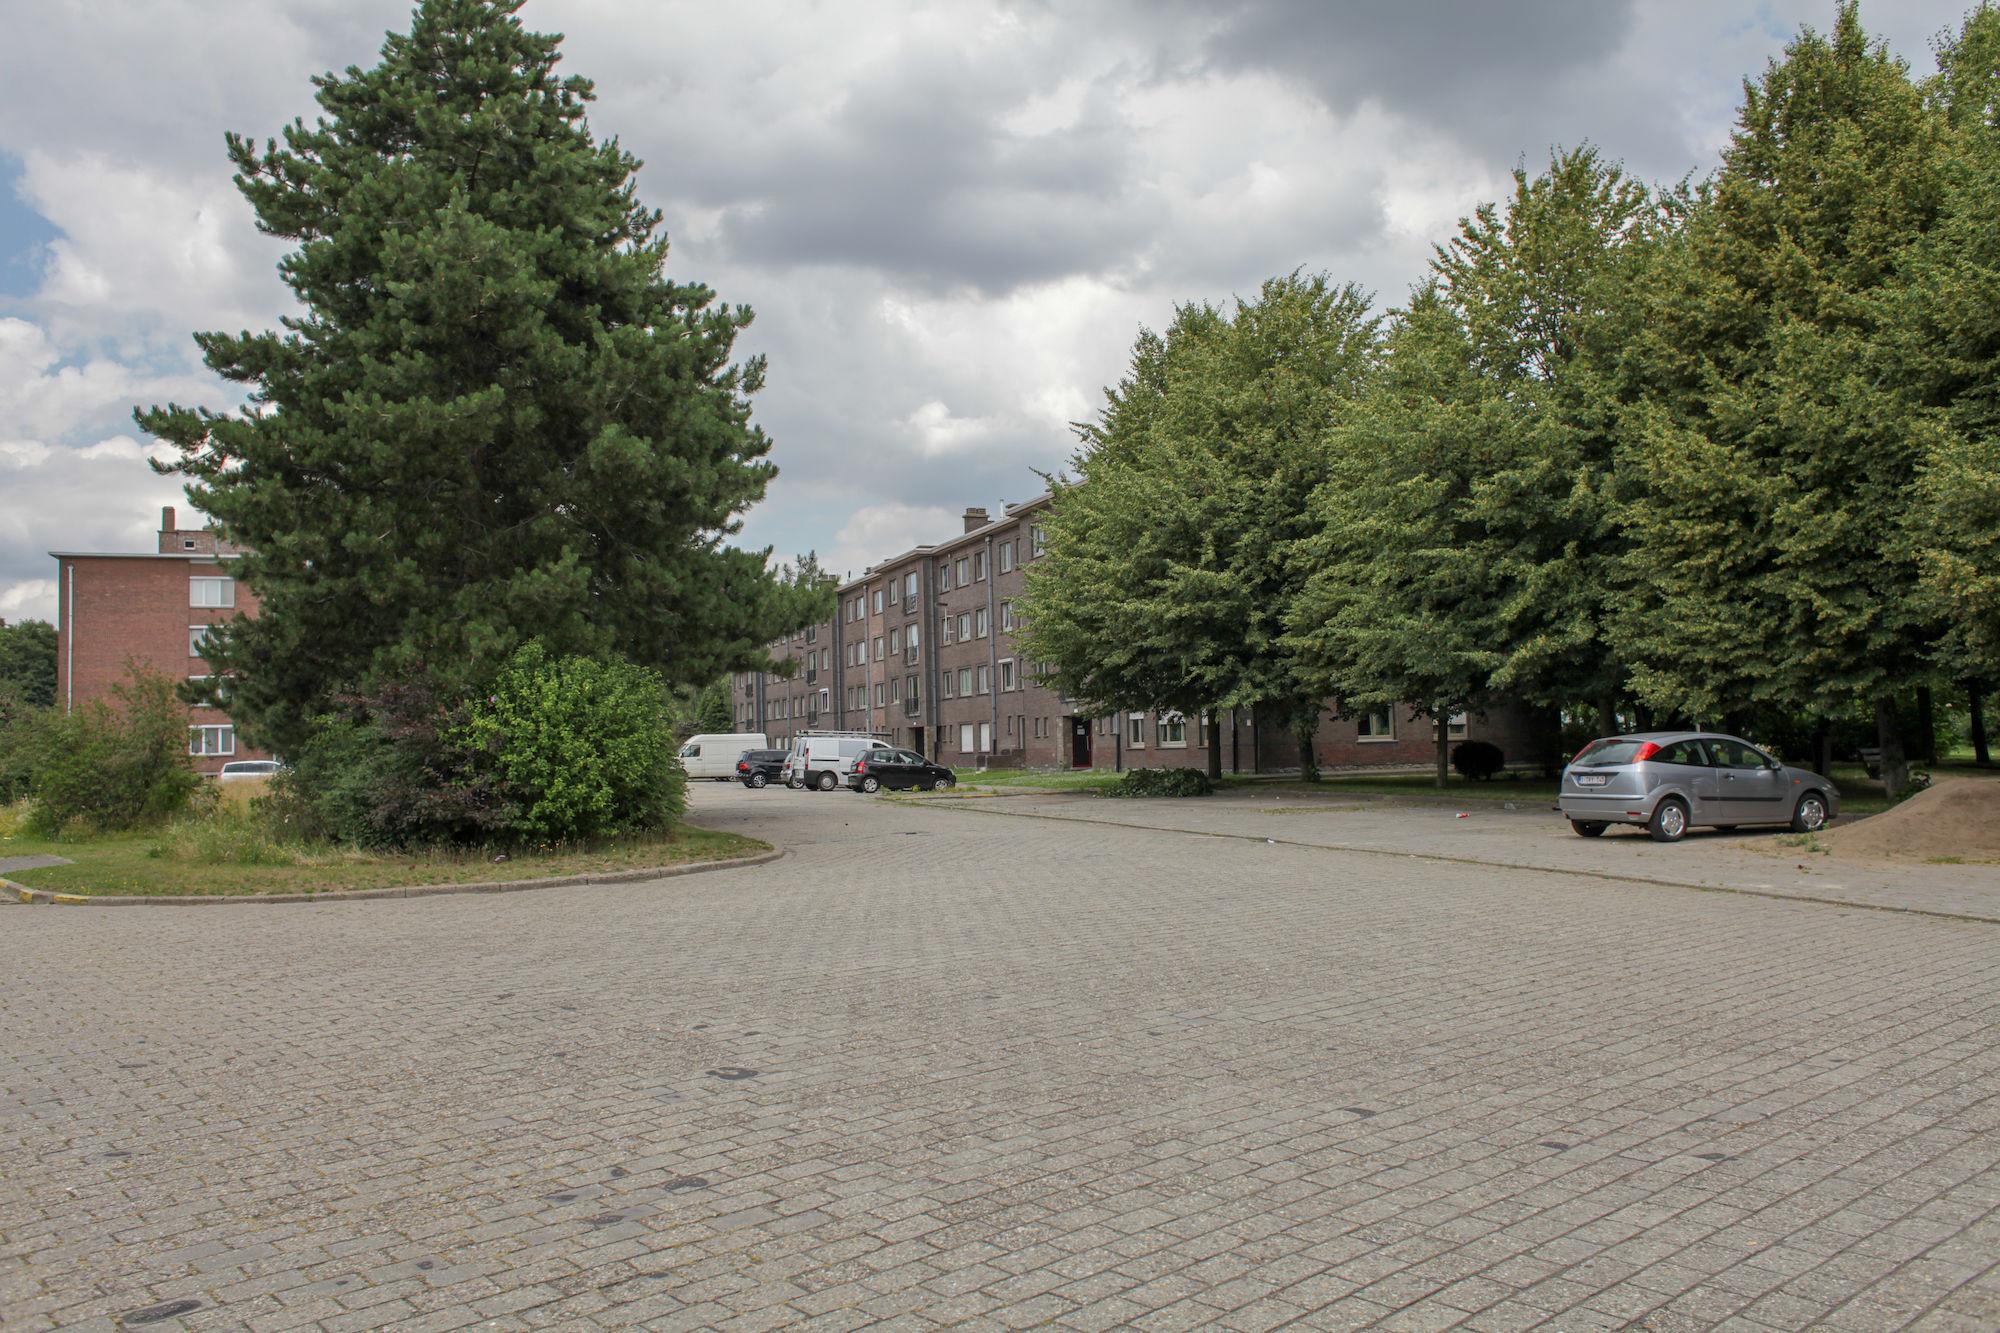 2019-07-02 Muide Meulestede prospectie Wannes_stadsvernieuwing_IMG_0350-2.jpg